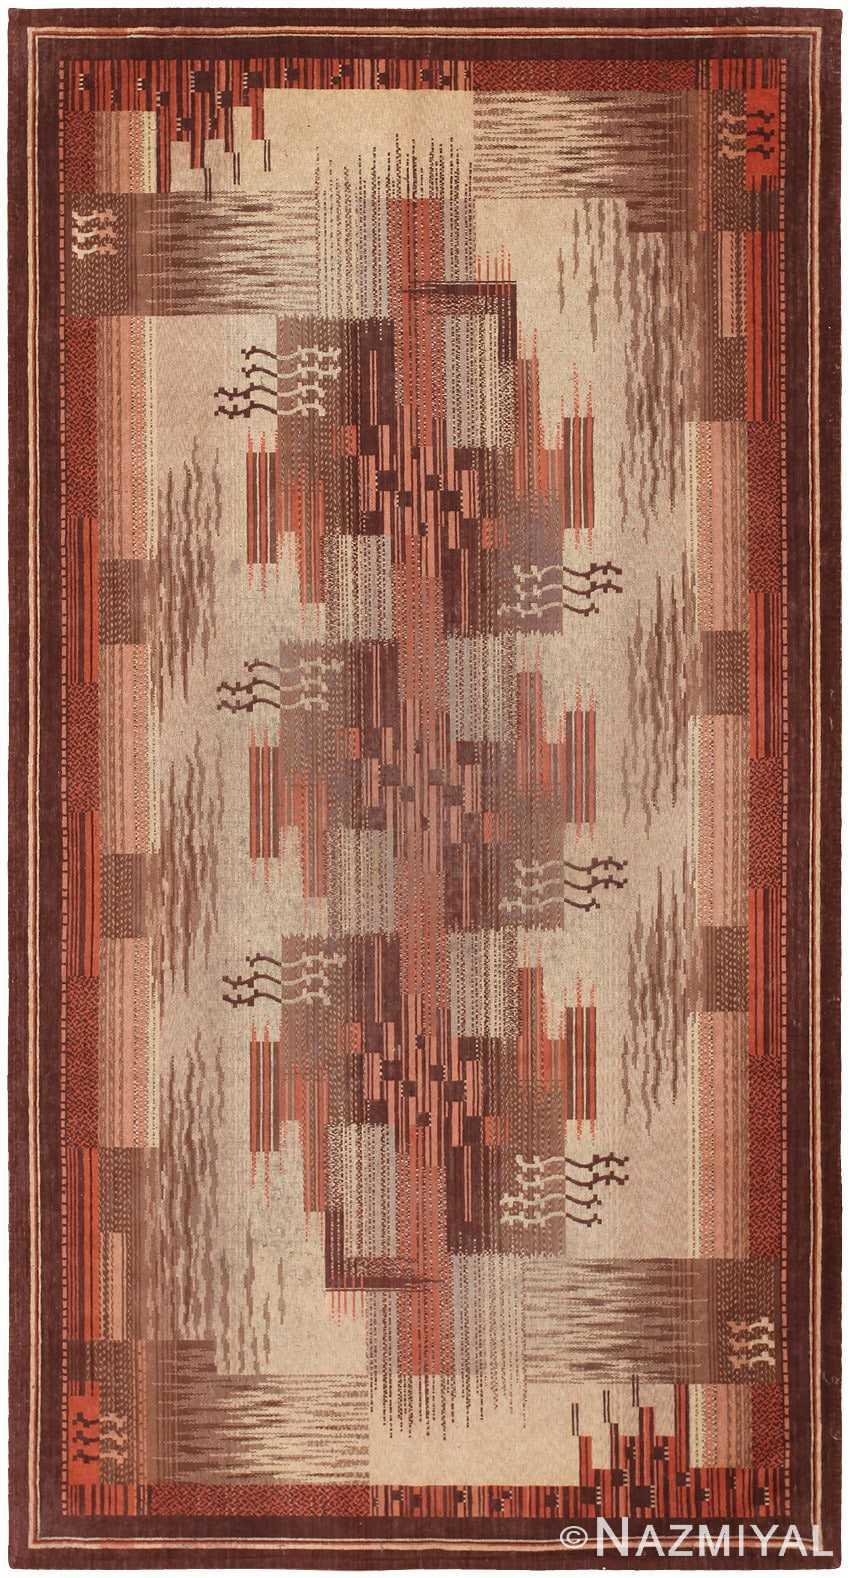 Antique French Art Deco Textile 46878 Nazmiyal